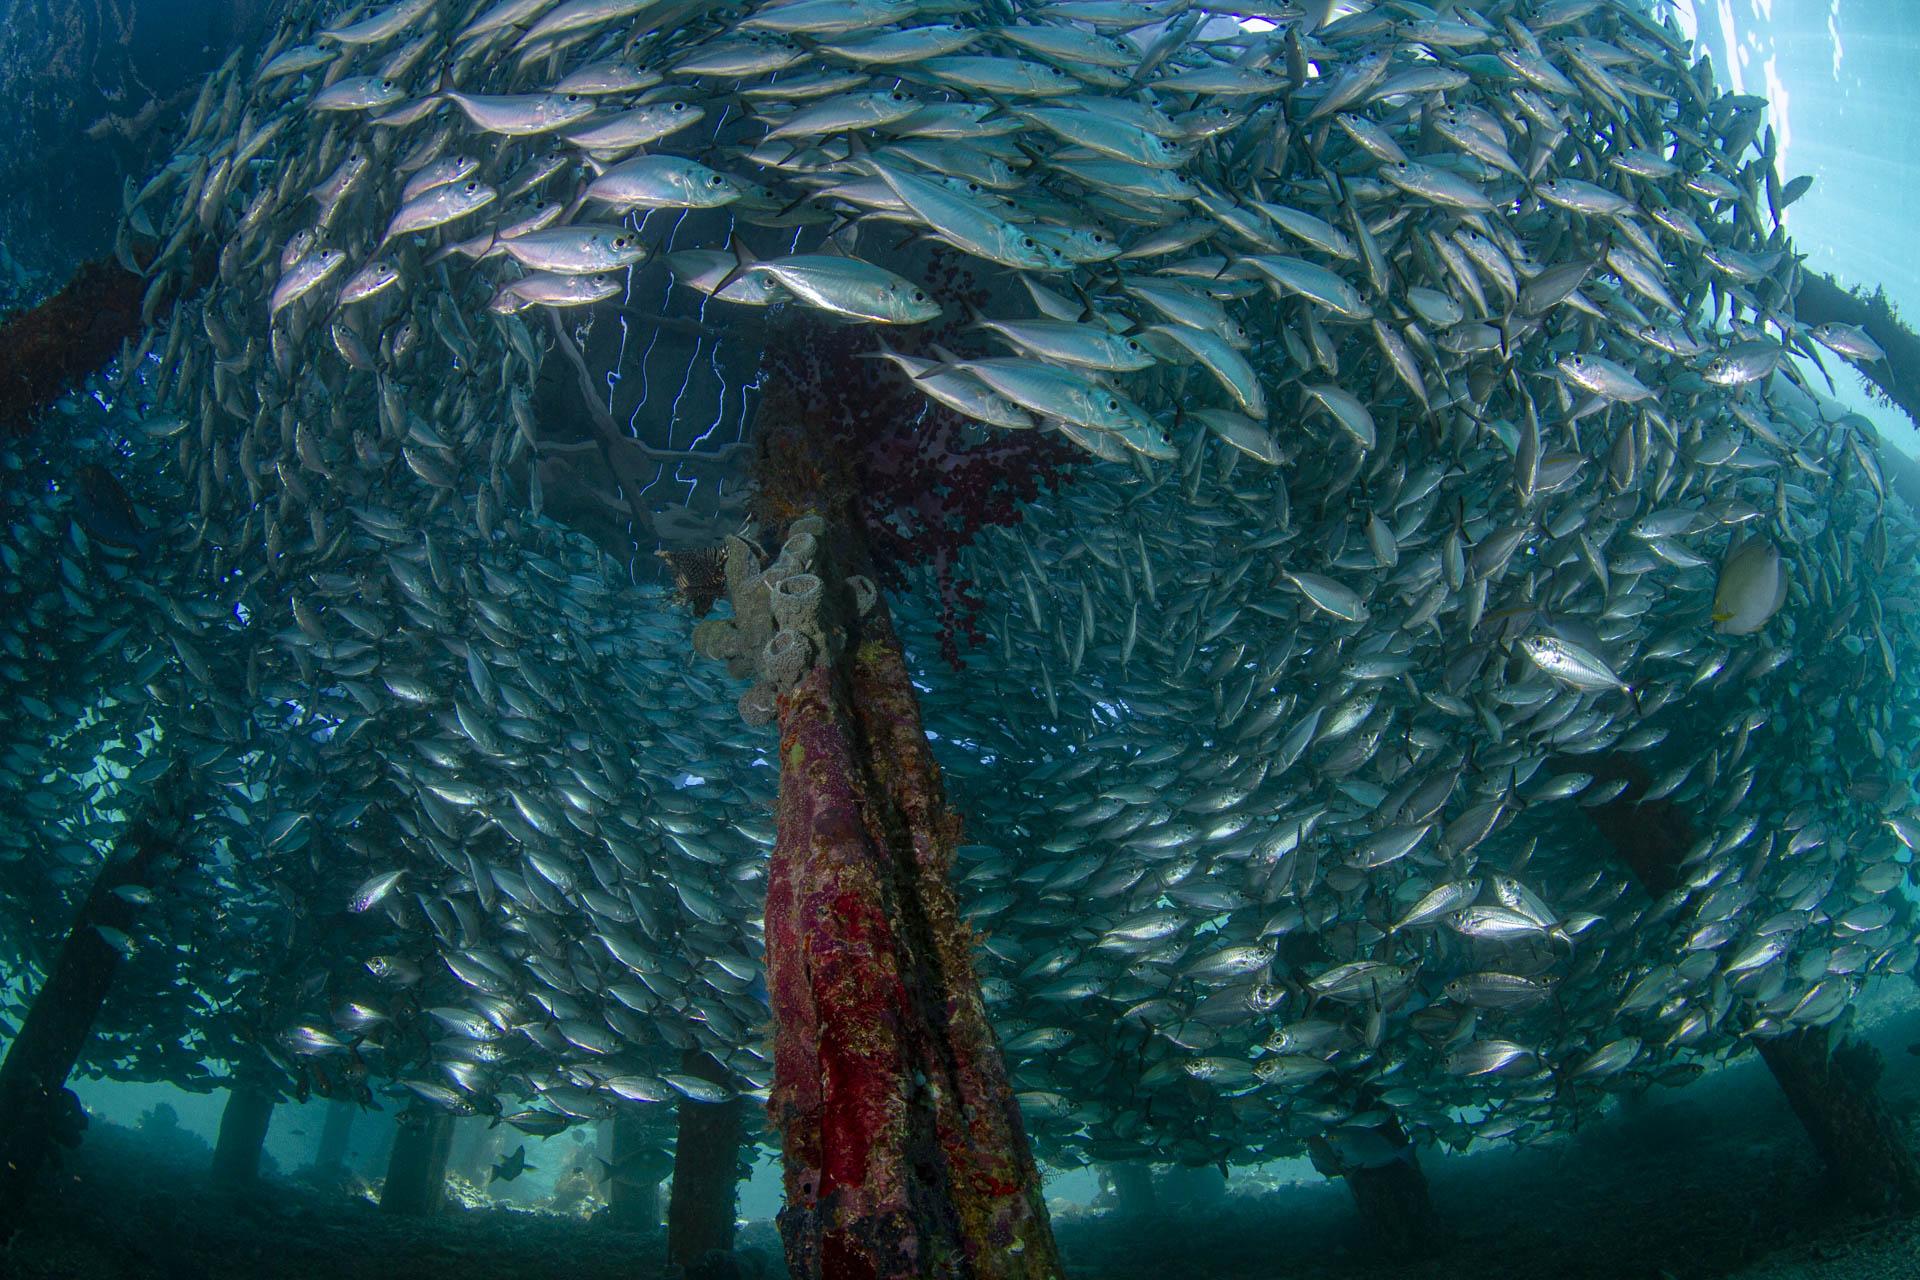 School of fish swirling around pier pilings